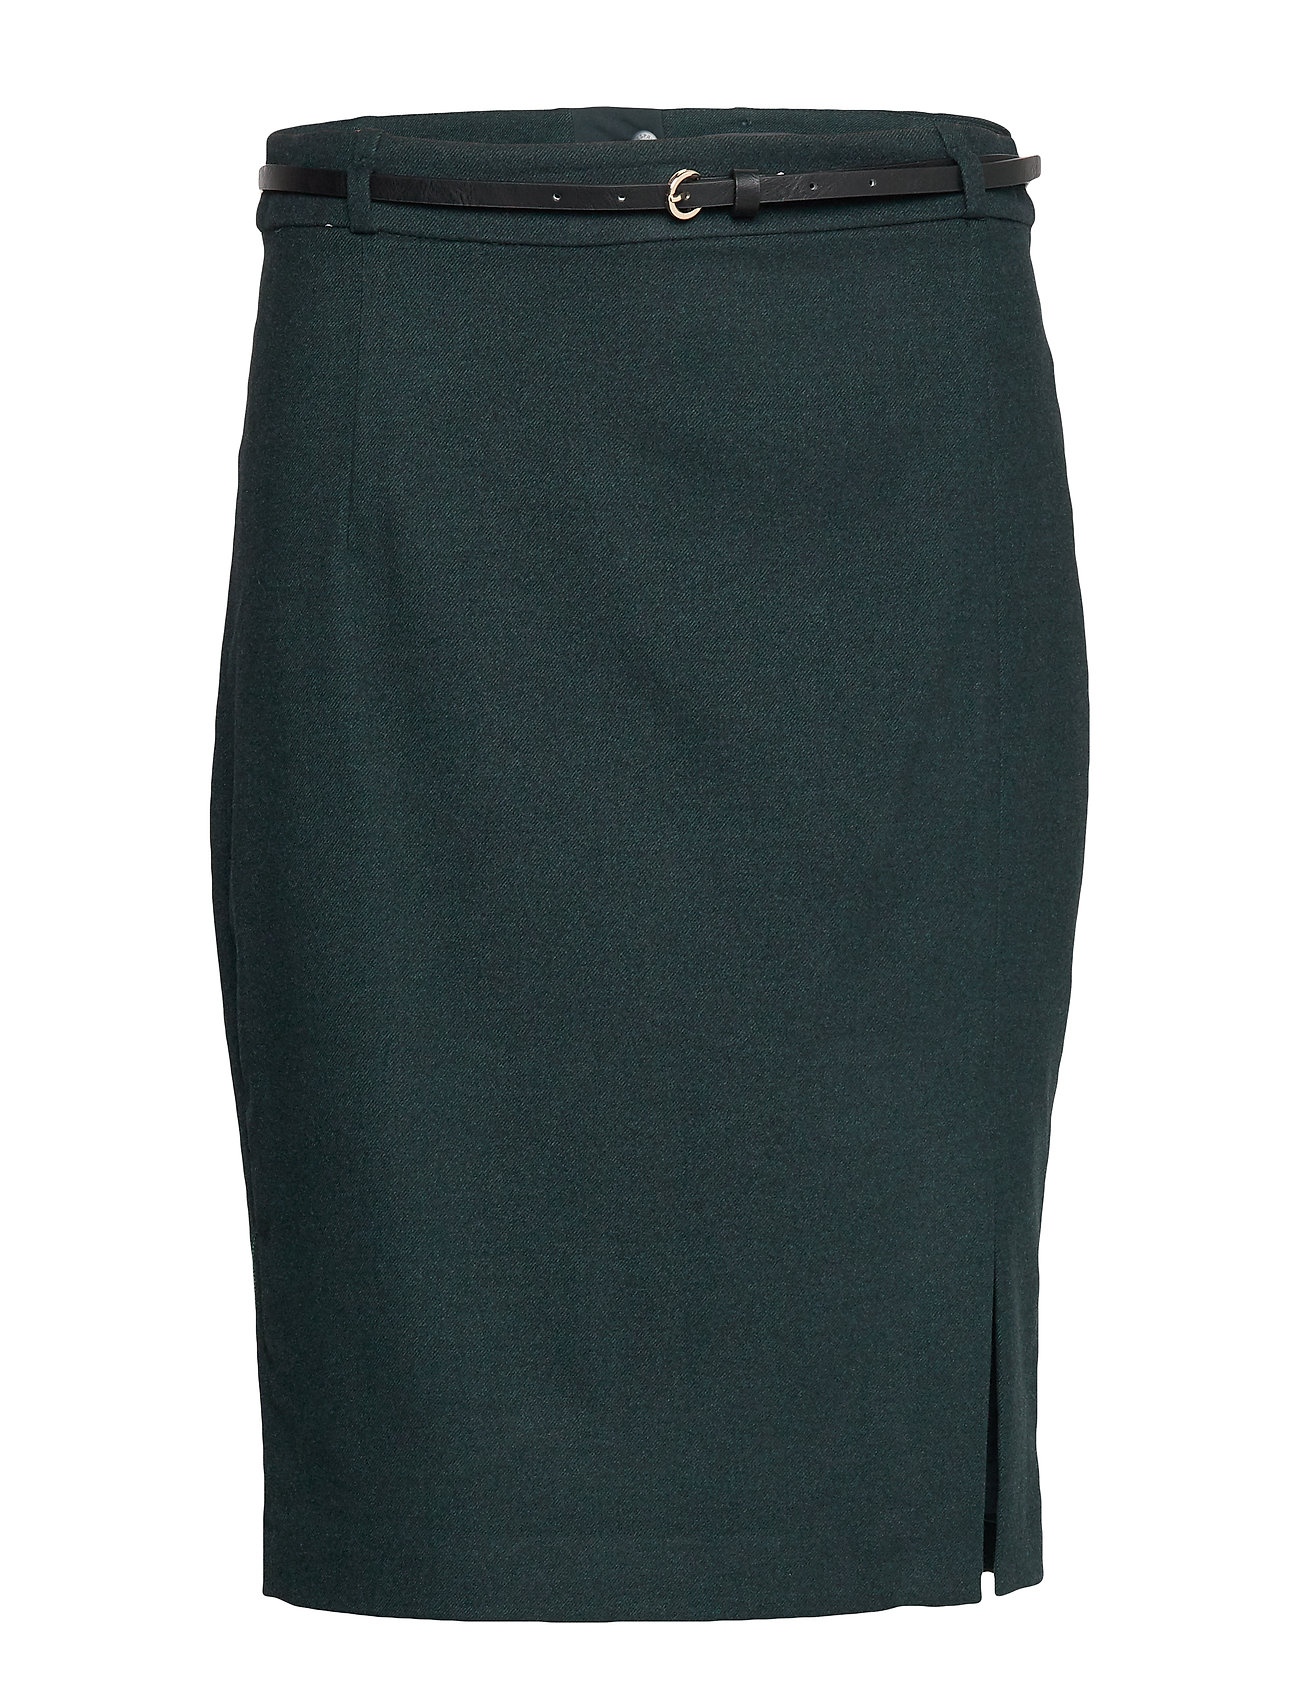 Esprit Collection Skirts woven - DARK TEAL GREEN